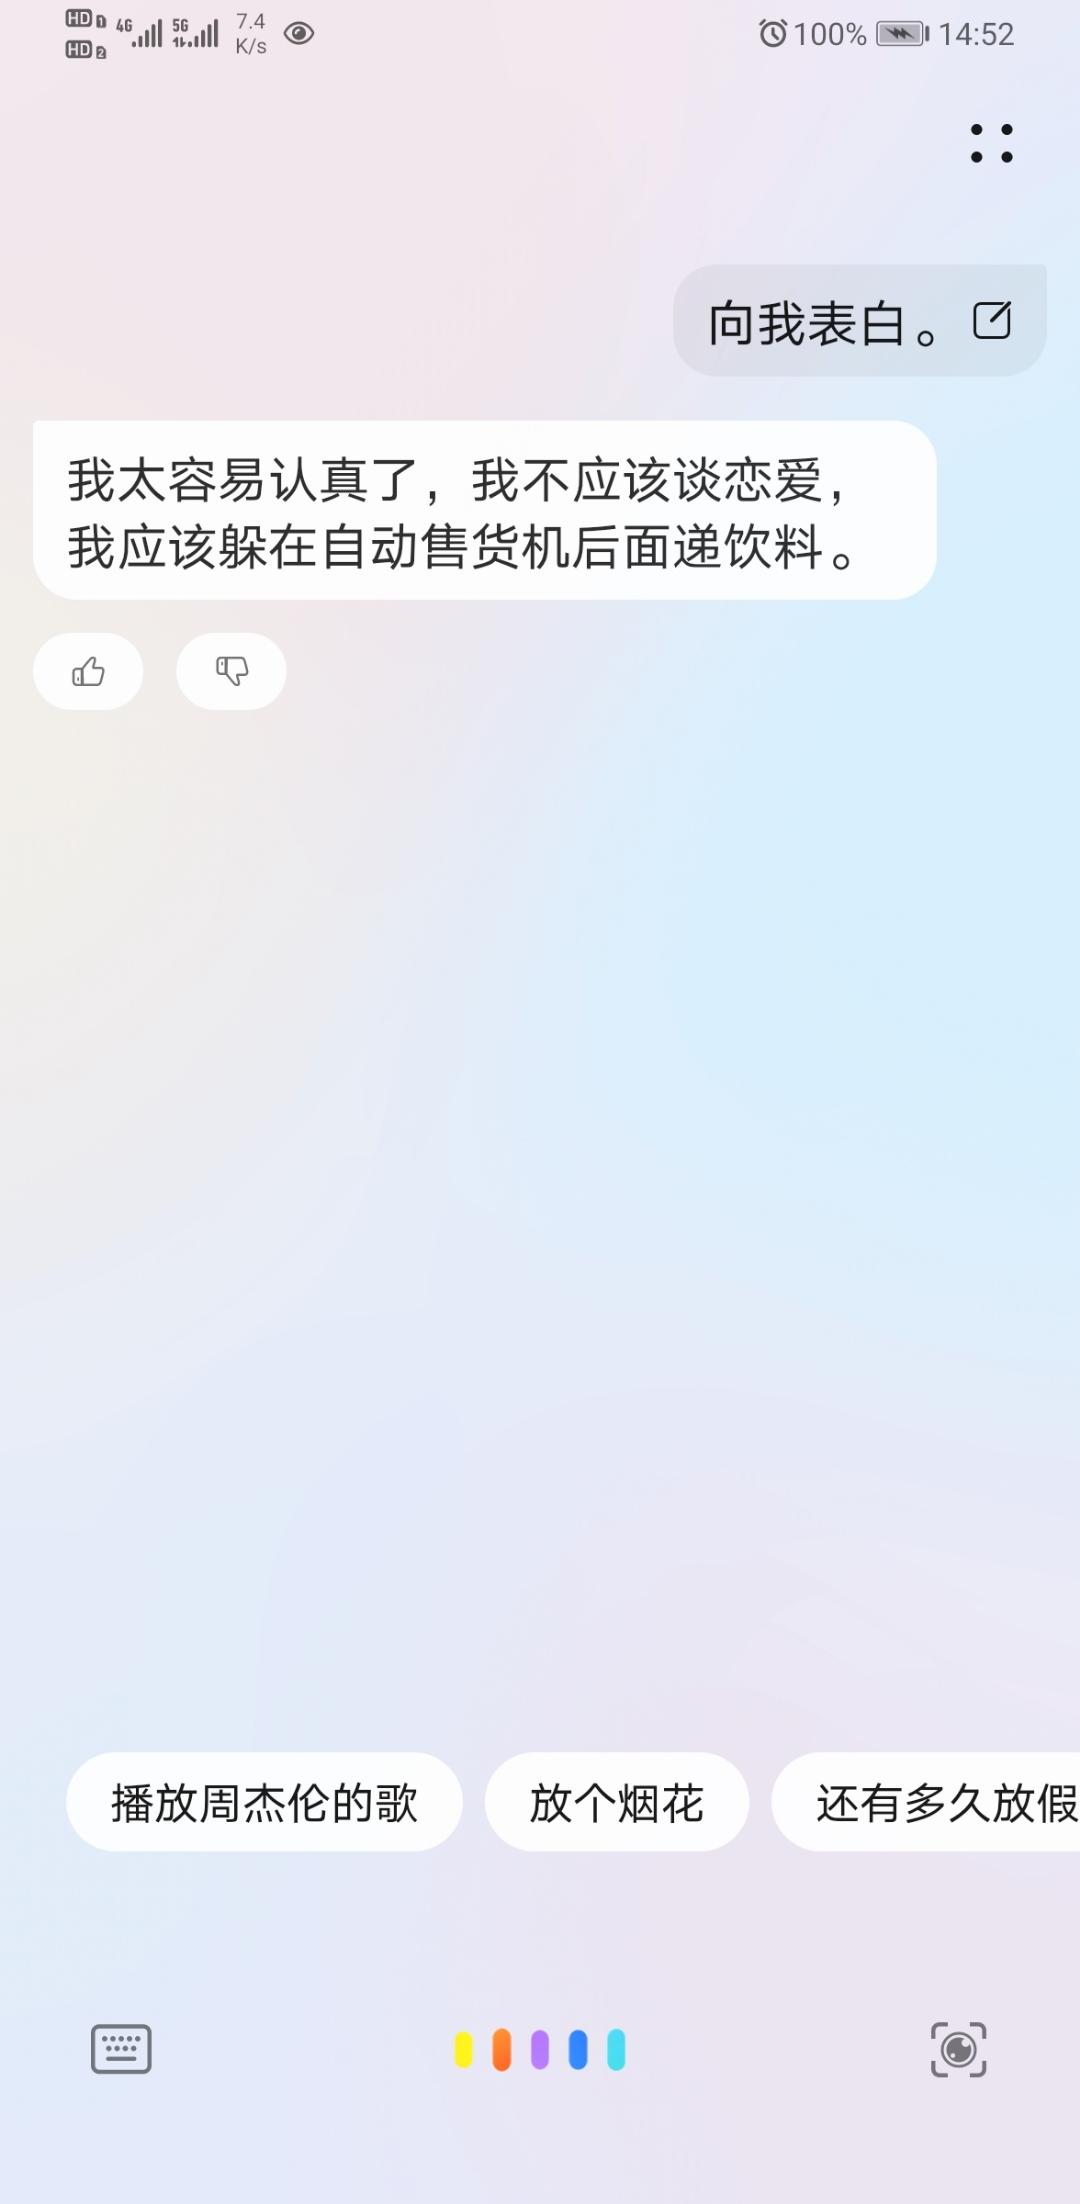 Screenshot_20210422_145211_com.huawei.vassistant.jpg